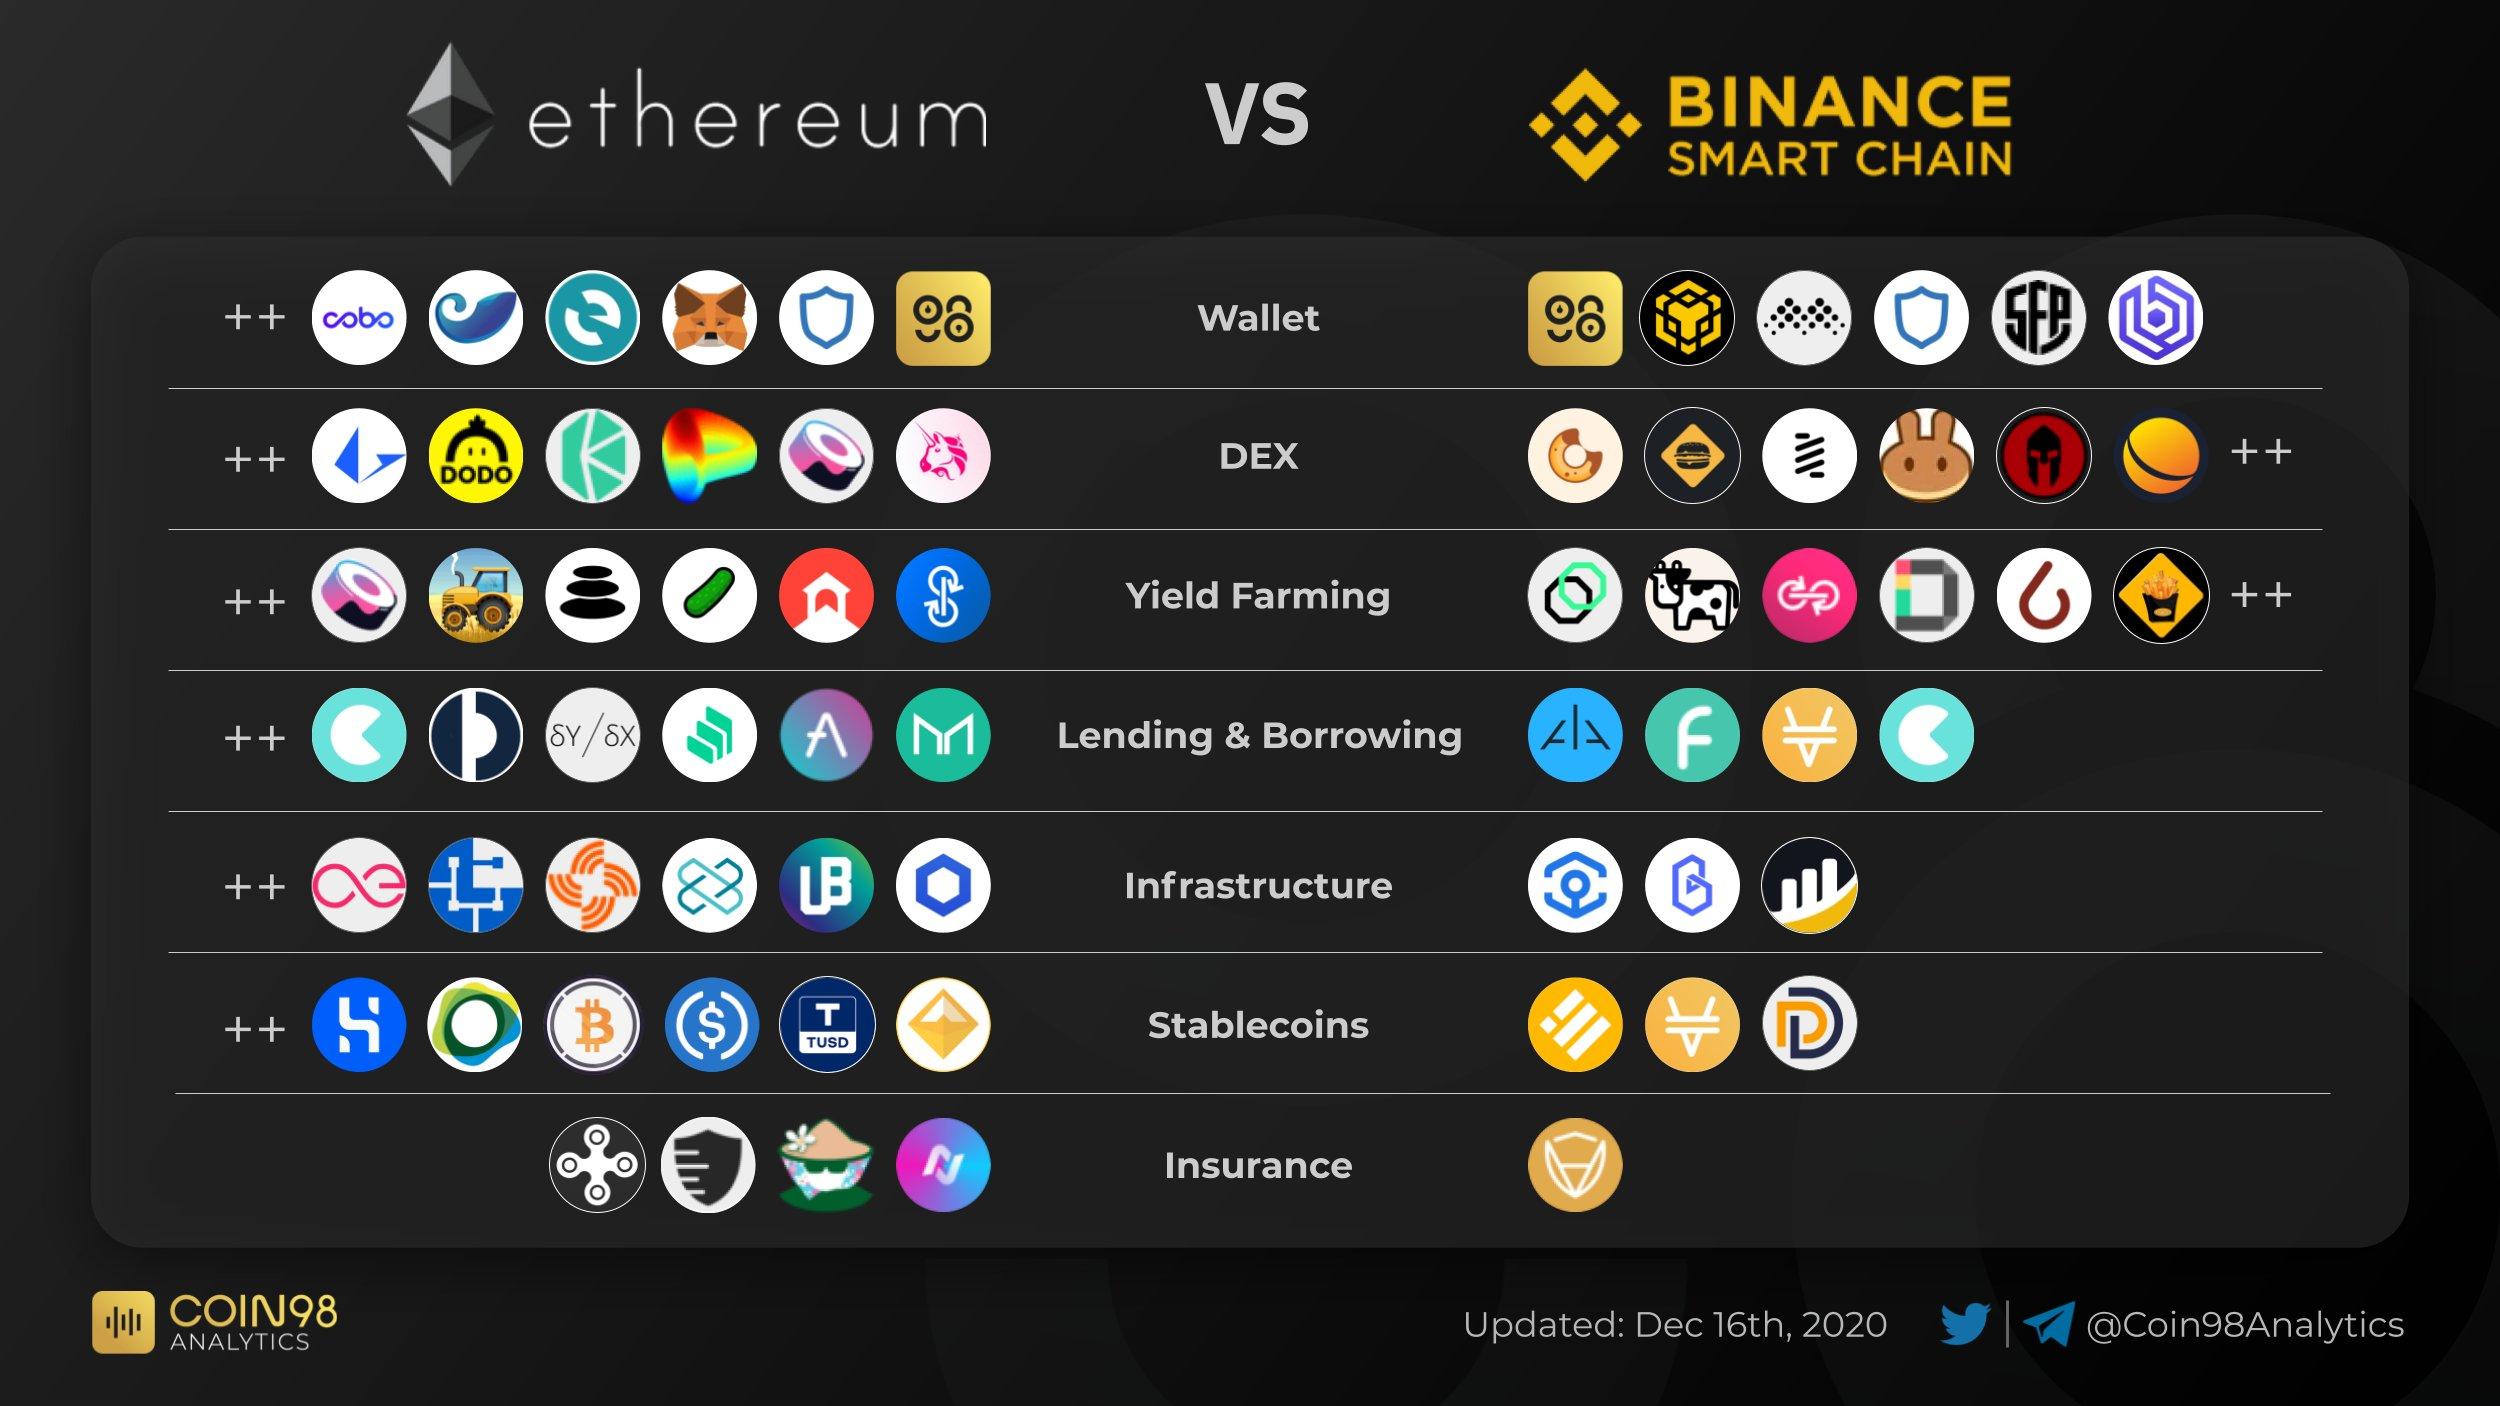 Информация о проектах на базе Ethereum и Binance Smart Chain